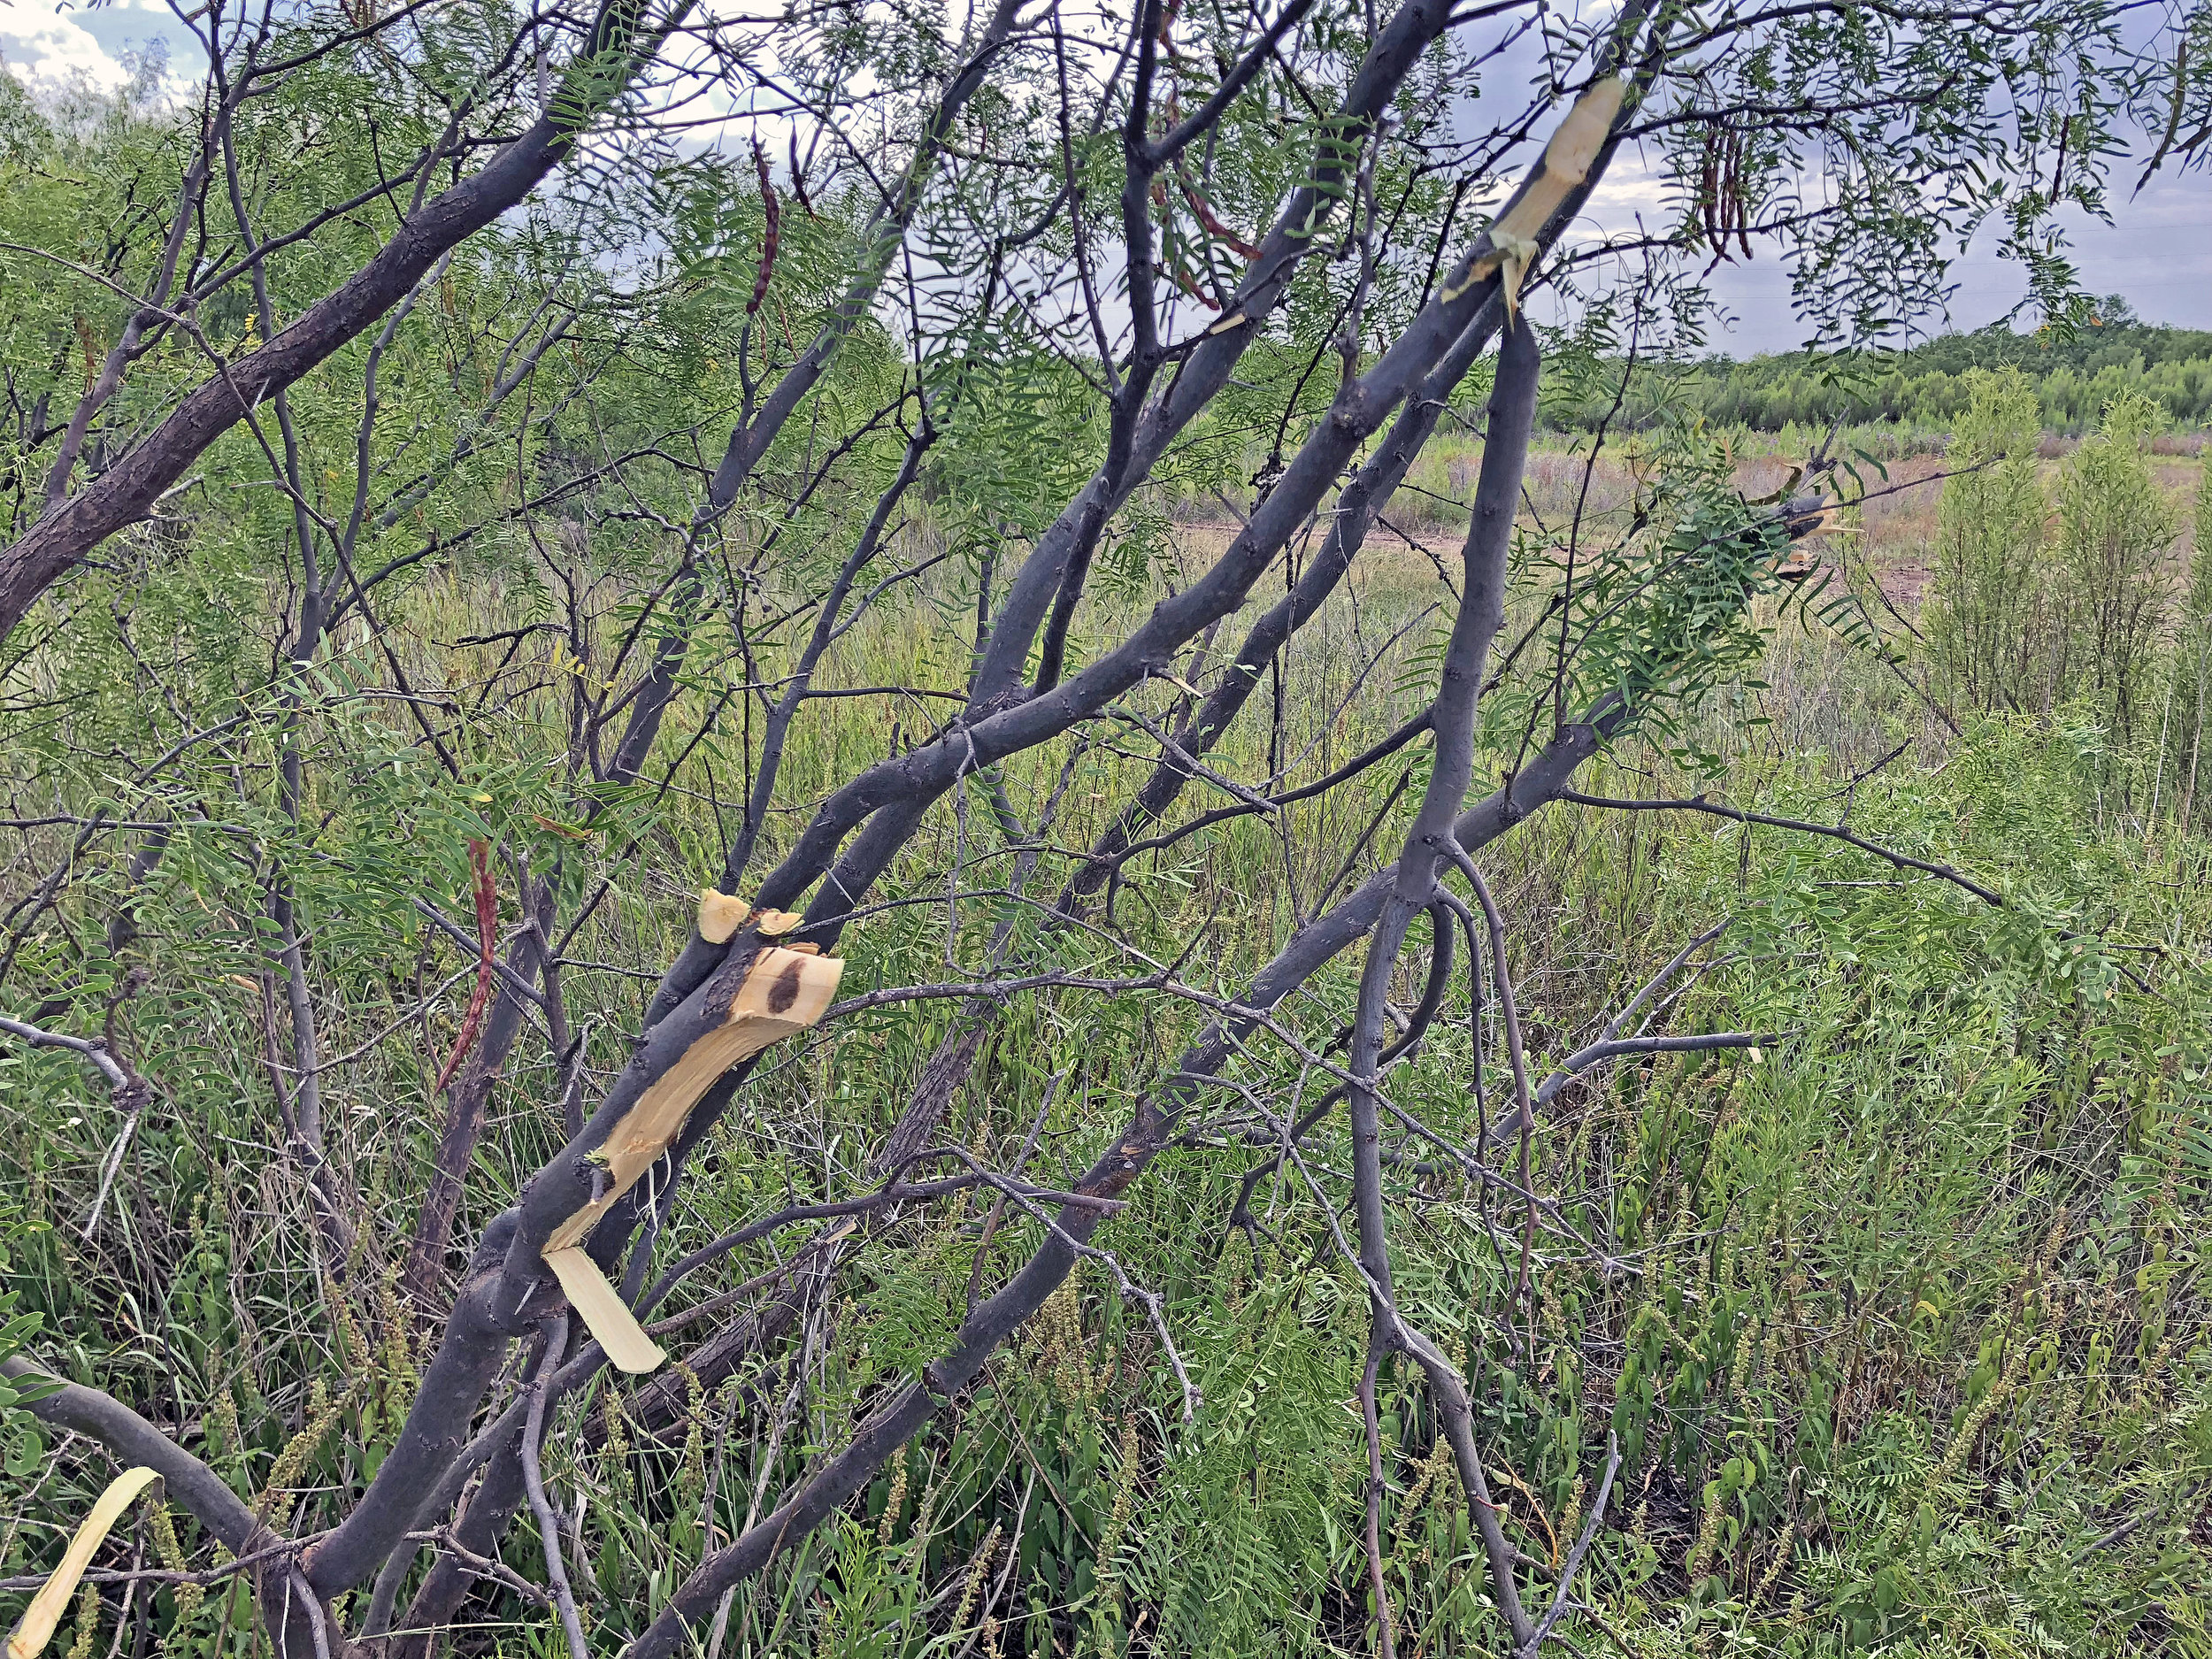 Kabar Kukri Tree Limb Clearing